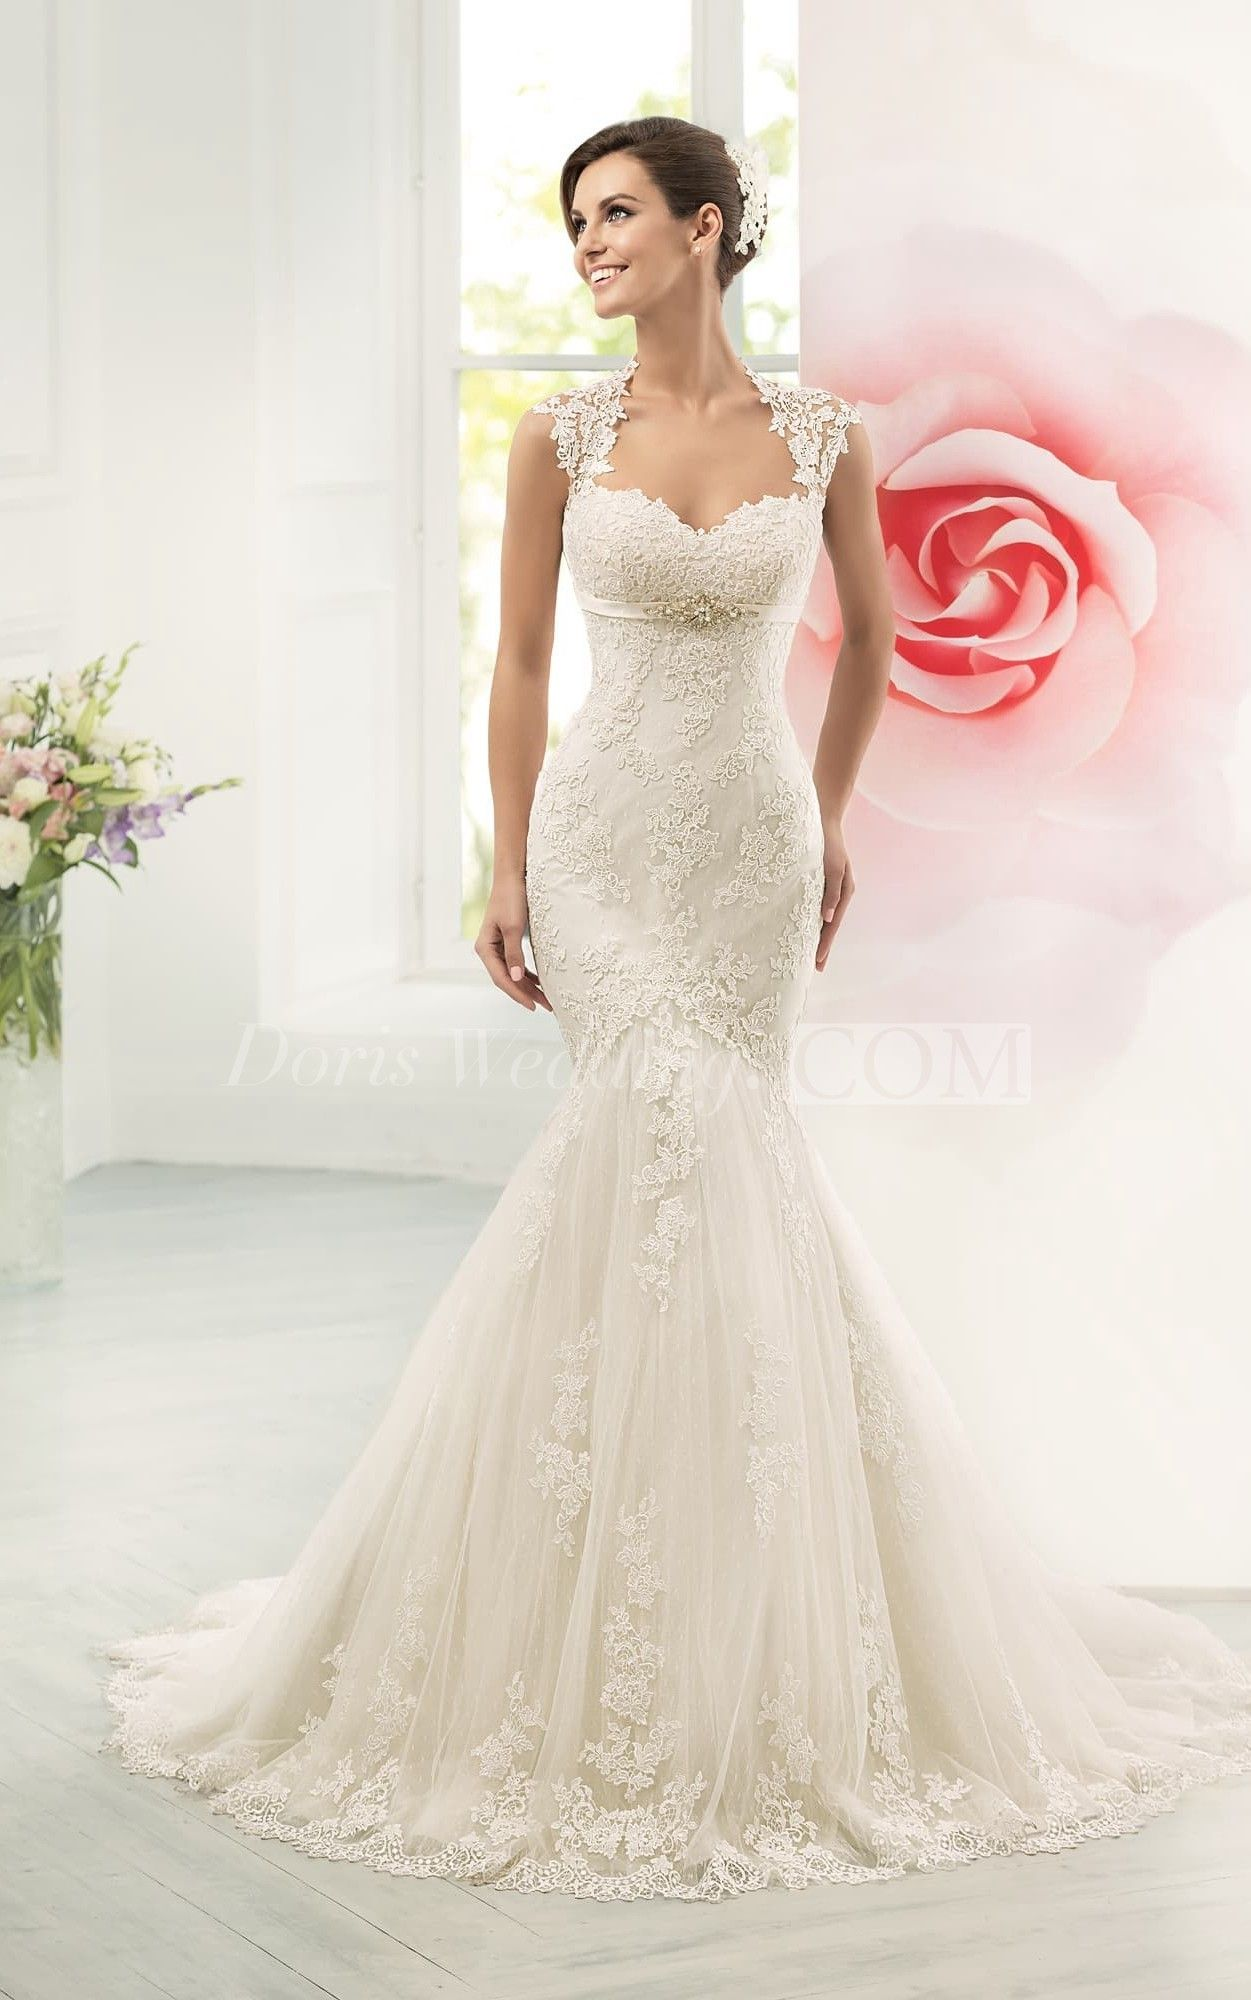 Us 156 89 Cap Sleeve Open Back Mermaid Lace Wedding Dress Www D Lace Mermaid Wedding Dress Lace Sweetheart Wedding Dress Wedding Dresses Sweetheart Neckline [ 2000 x 1251 Pixel ]